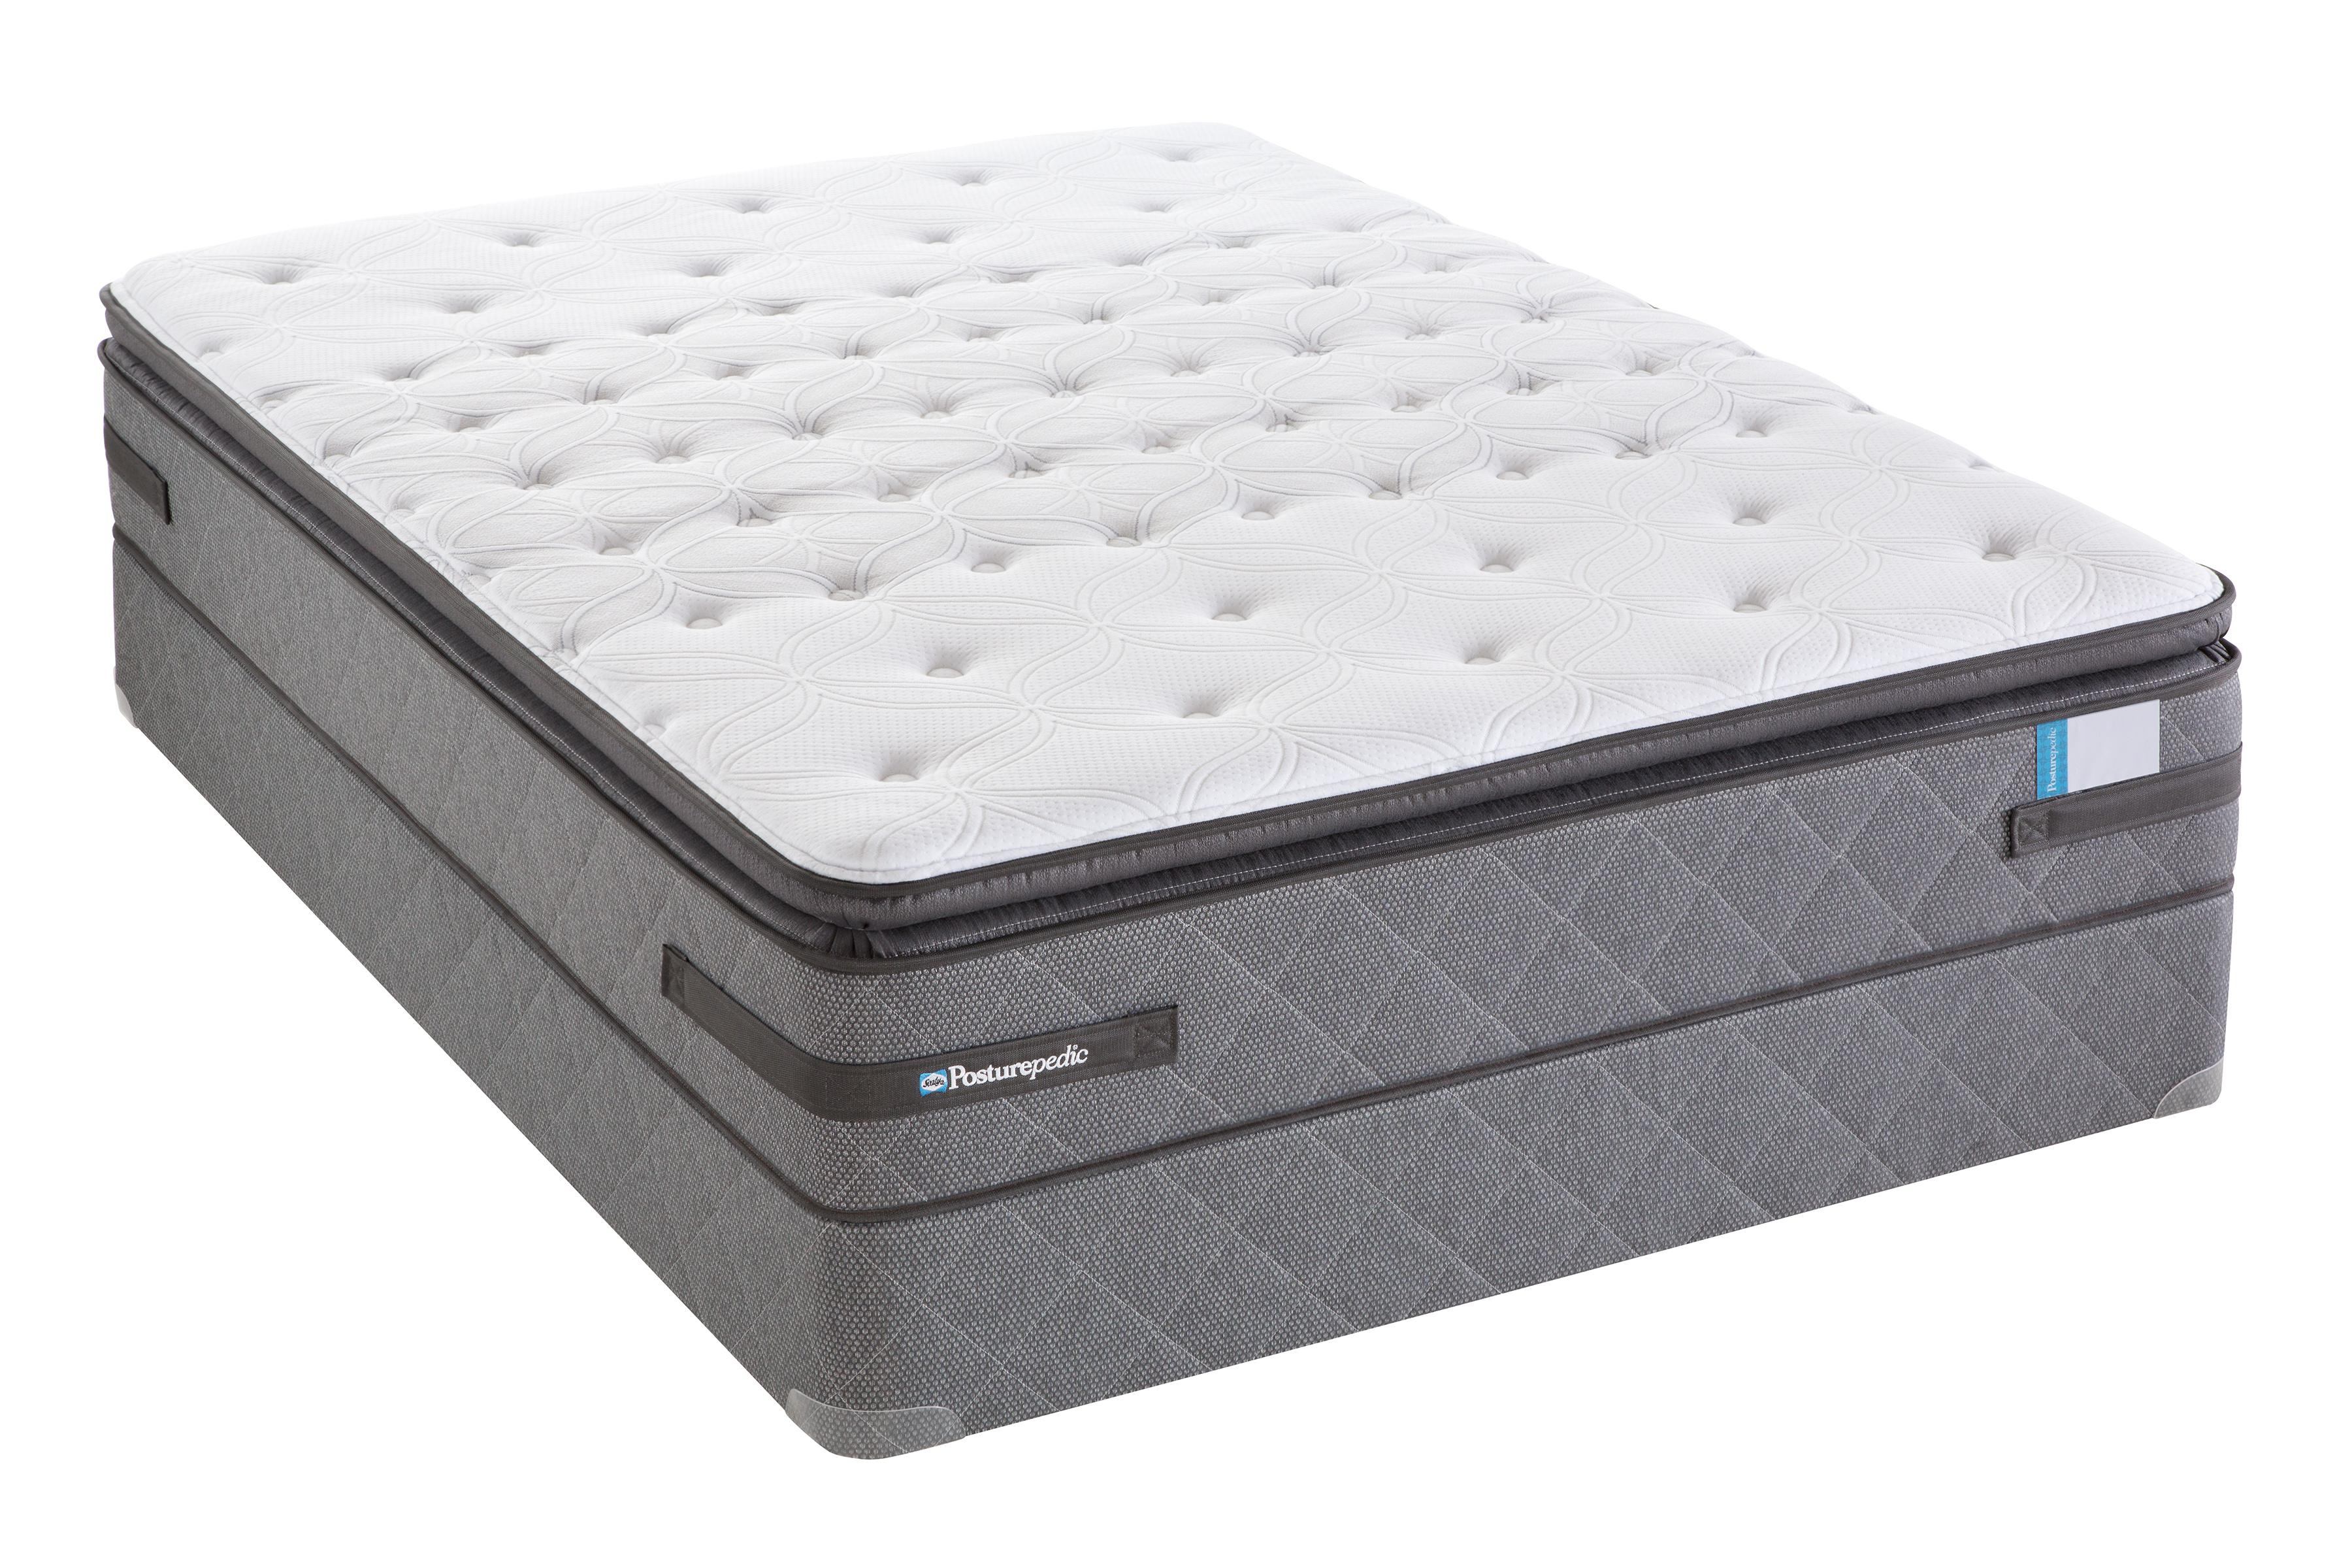 Sealy Posturepedic Mackville Cushion Firm Euro Top King Mattress Home Mattresses